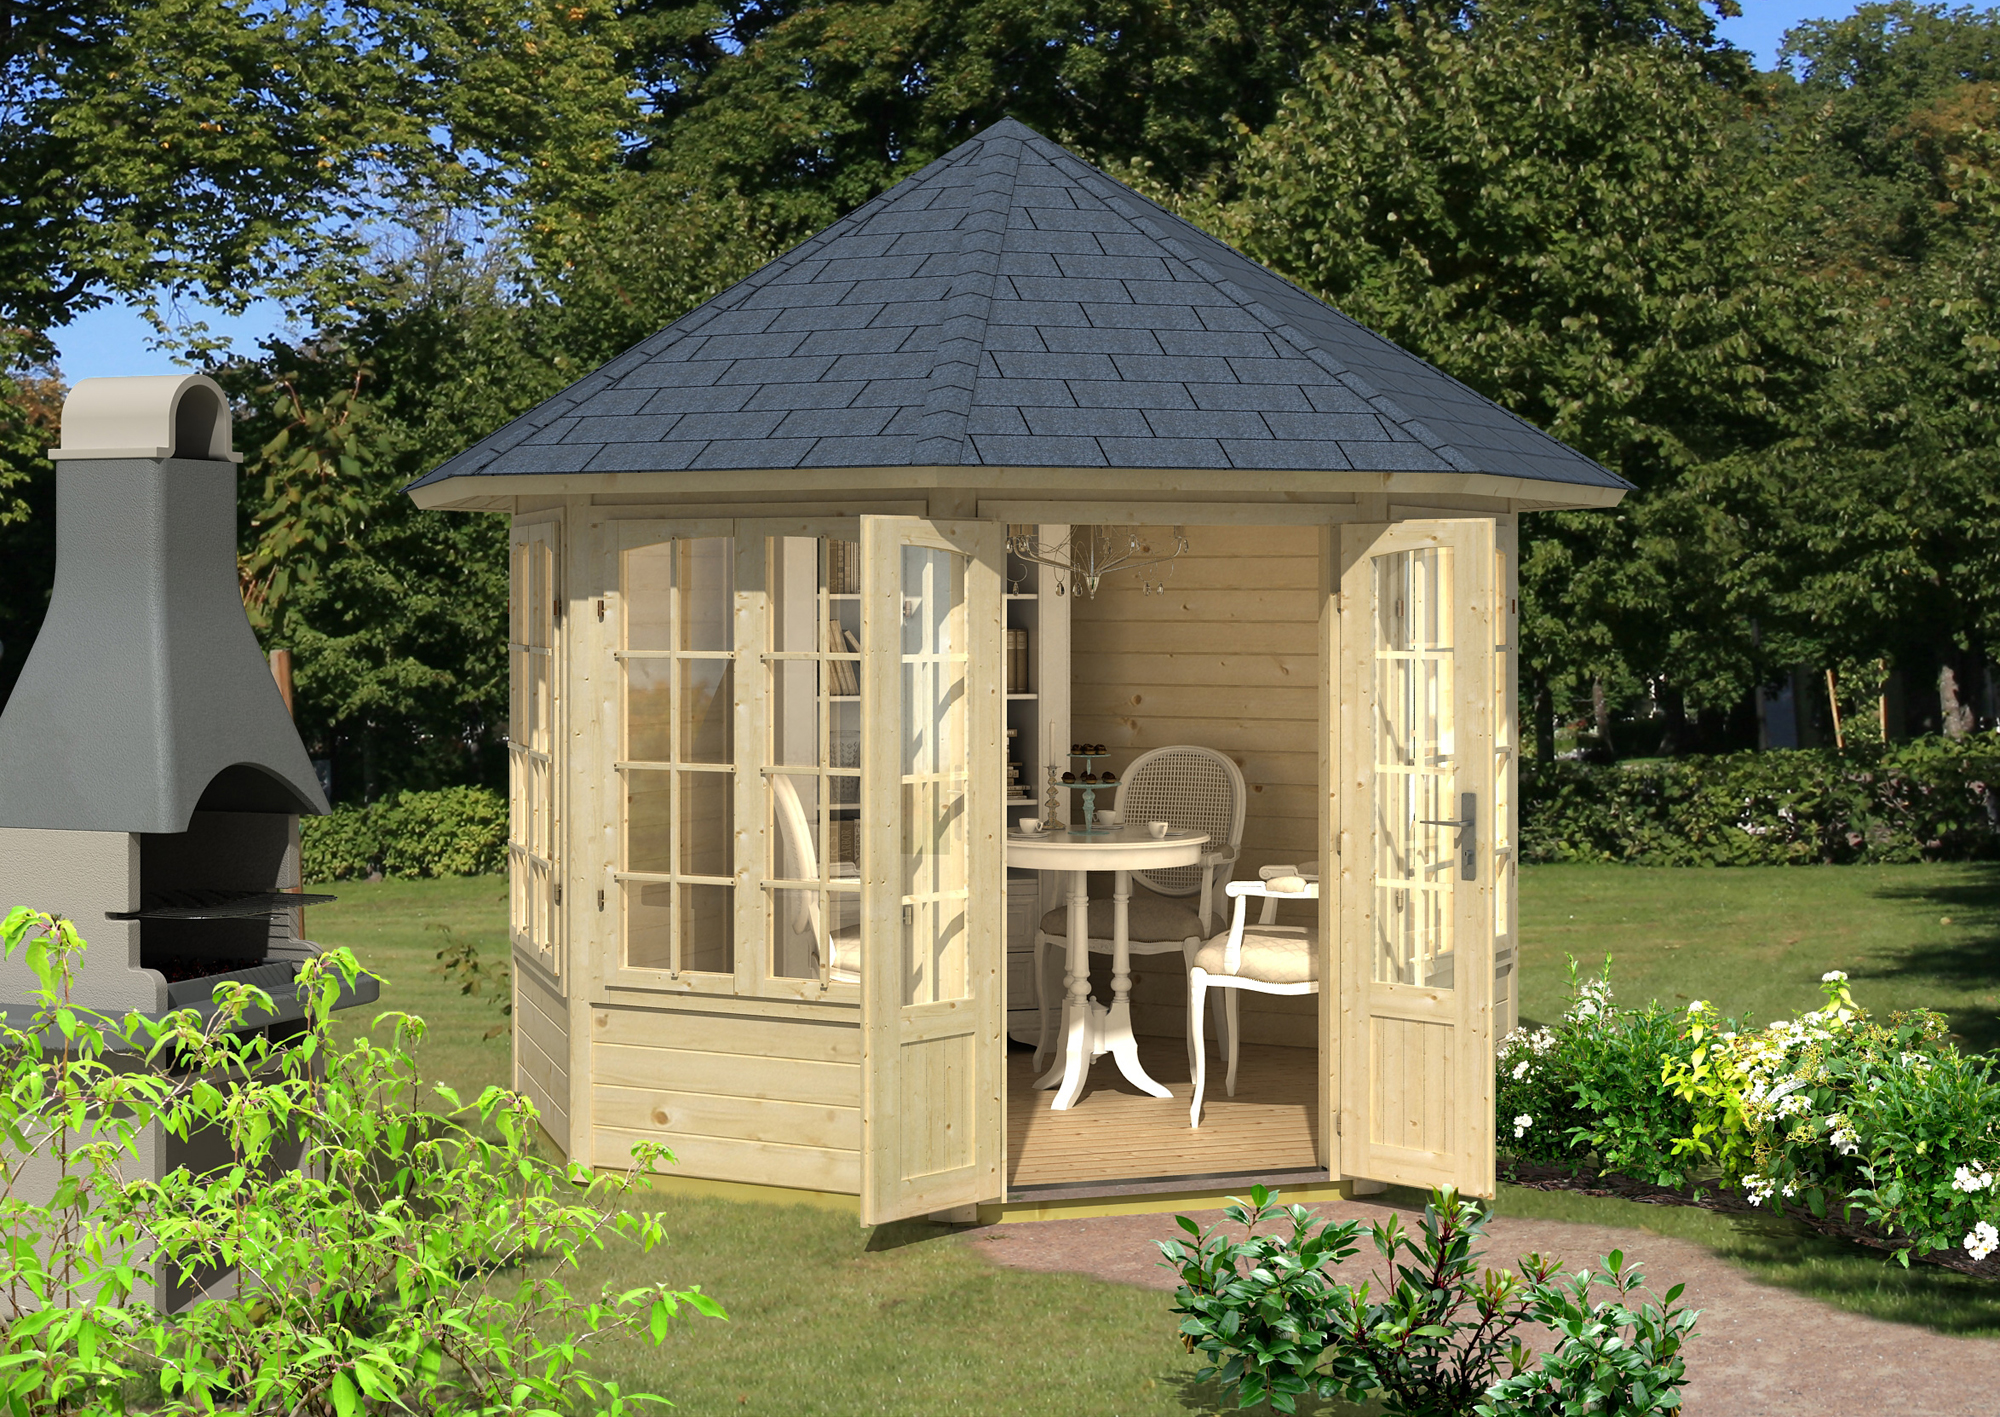 gartenpavillon modell louise 40 mit vier fenstern 122420. Black Bedroom Furniture Sets. Home Design Ideas